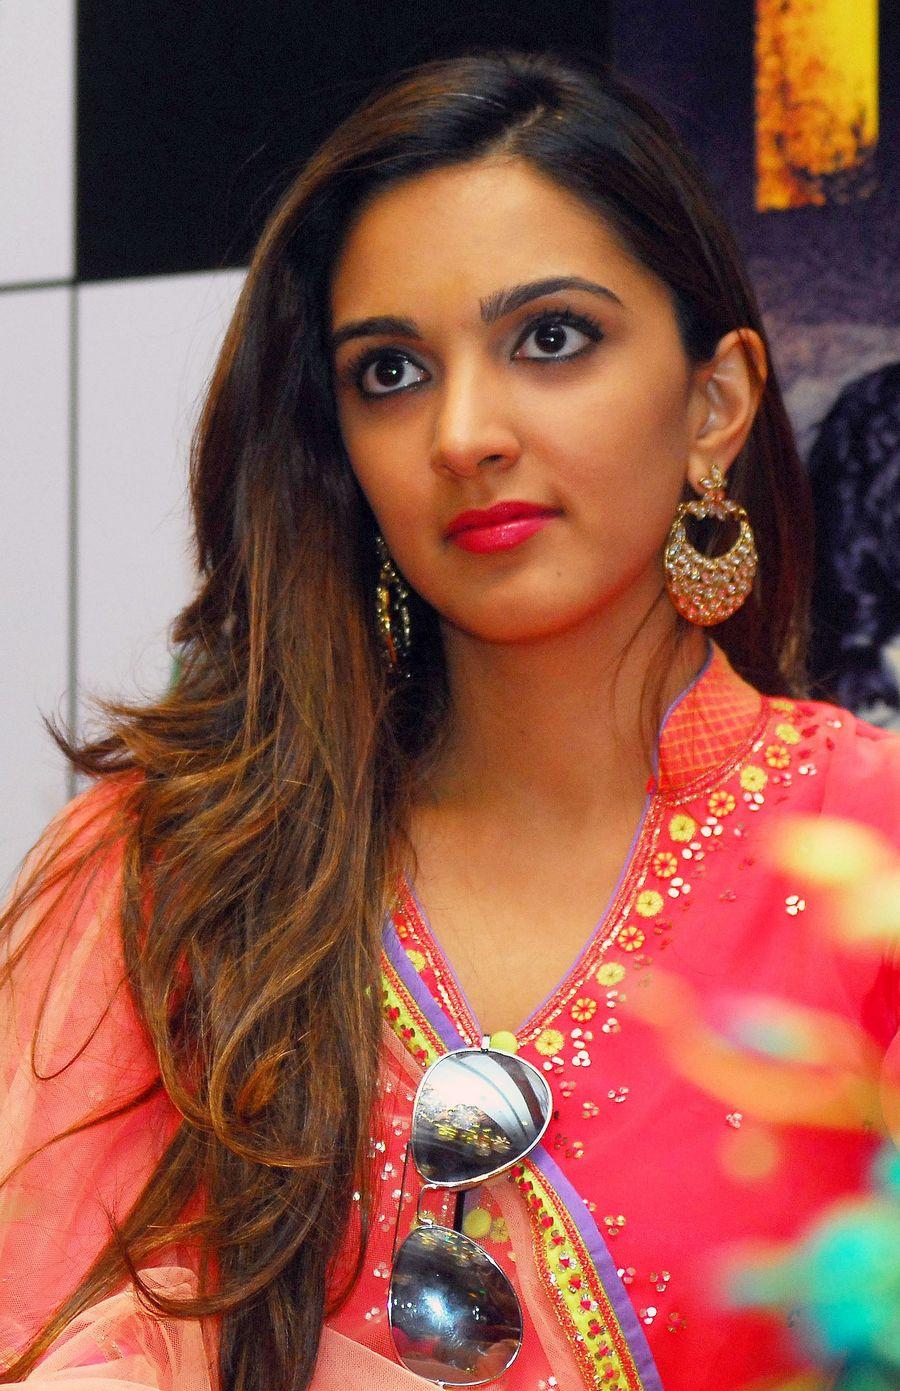 Kiara advani cute look photos